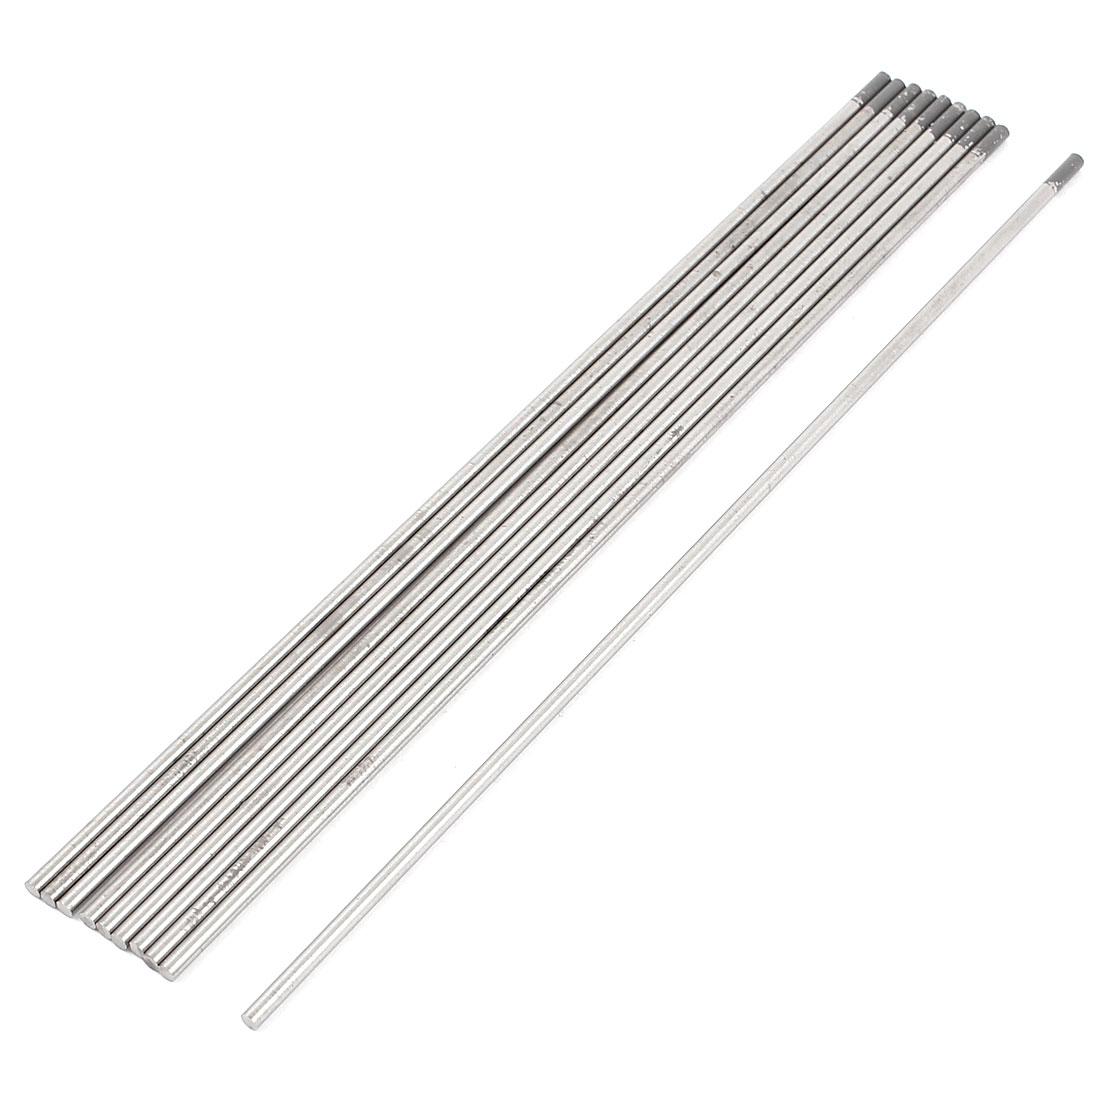 "10 Pcs TIG Welding 2% Ceriated Tungsten Electrodes WC20 3/32"" x 7"""